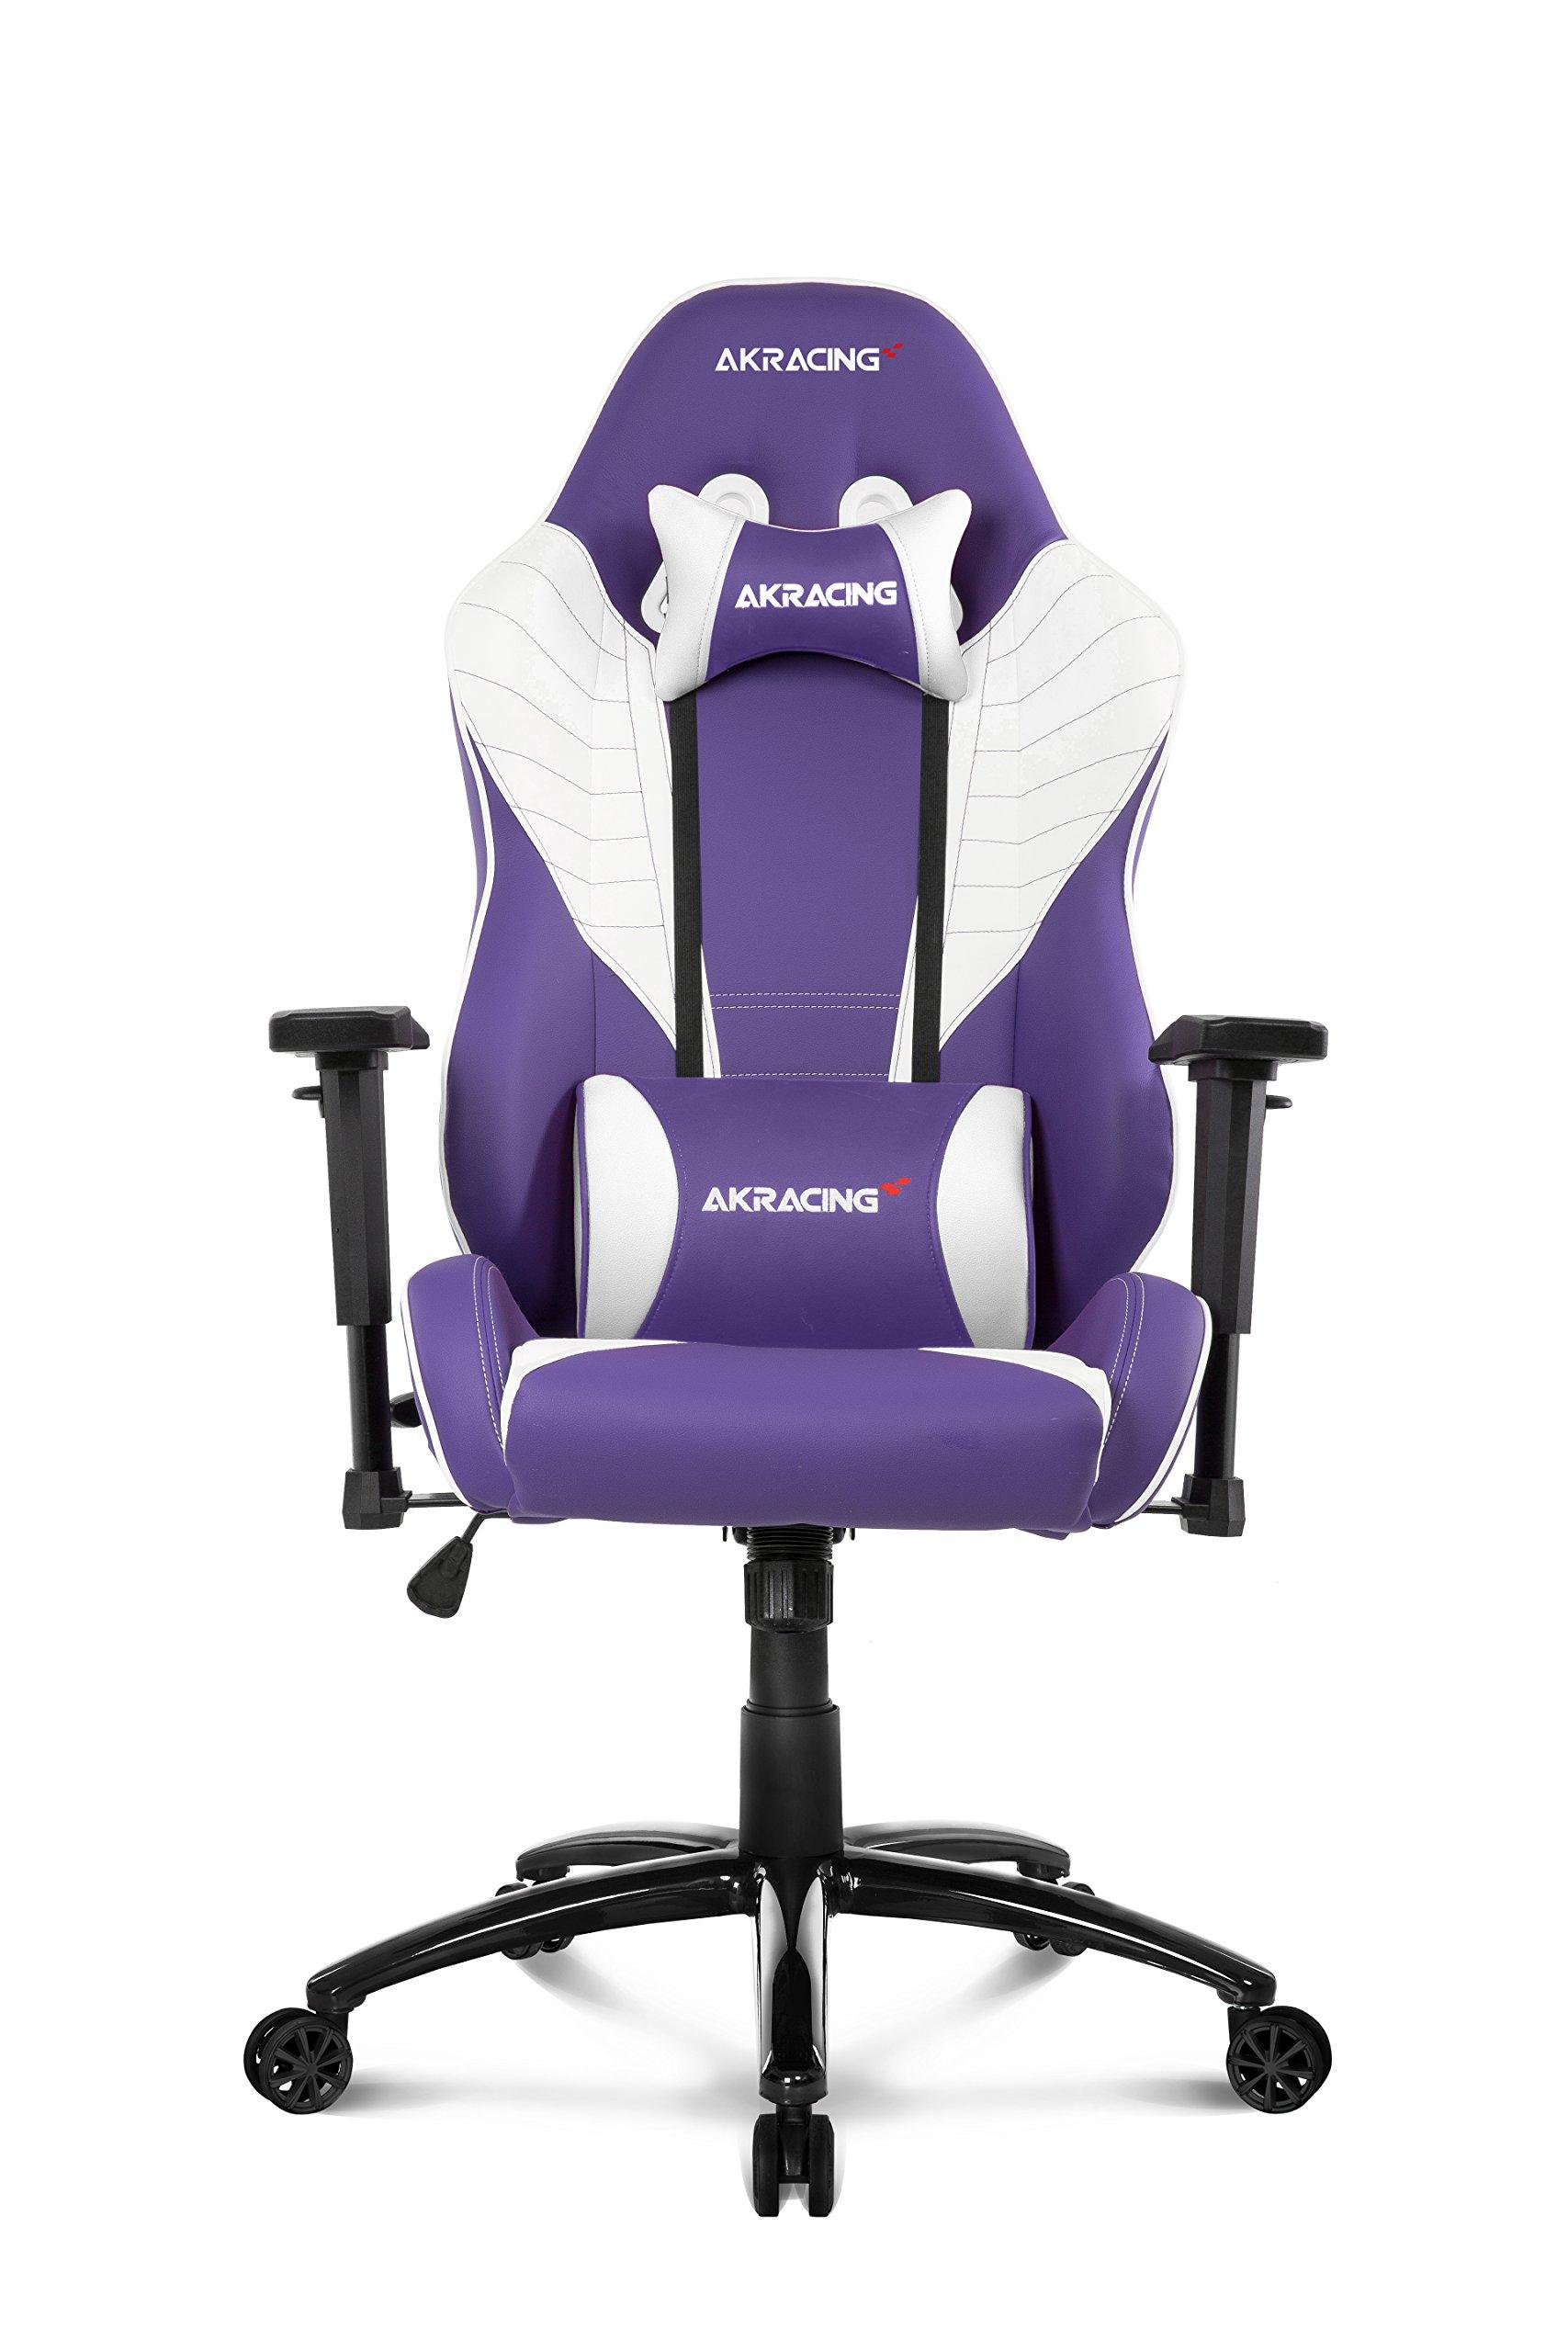 Lavender Gaming Chair : lavender, gaming, chair, GTRACING, Gaming, Chair, 400lb, Memory, Computer, Chair-Adjustable, Tilt,Upgrade, Mechanism,4D, Ergonomic, High-Back, Leather, Carbon, Fiber, Racing, Executive, Office, Chair,, Metal, Base(Black)